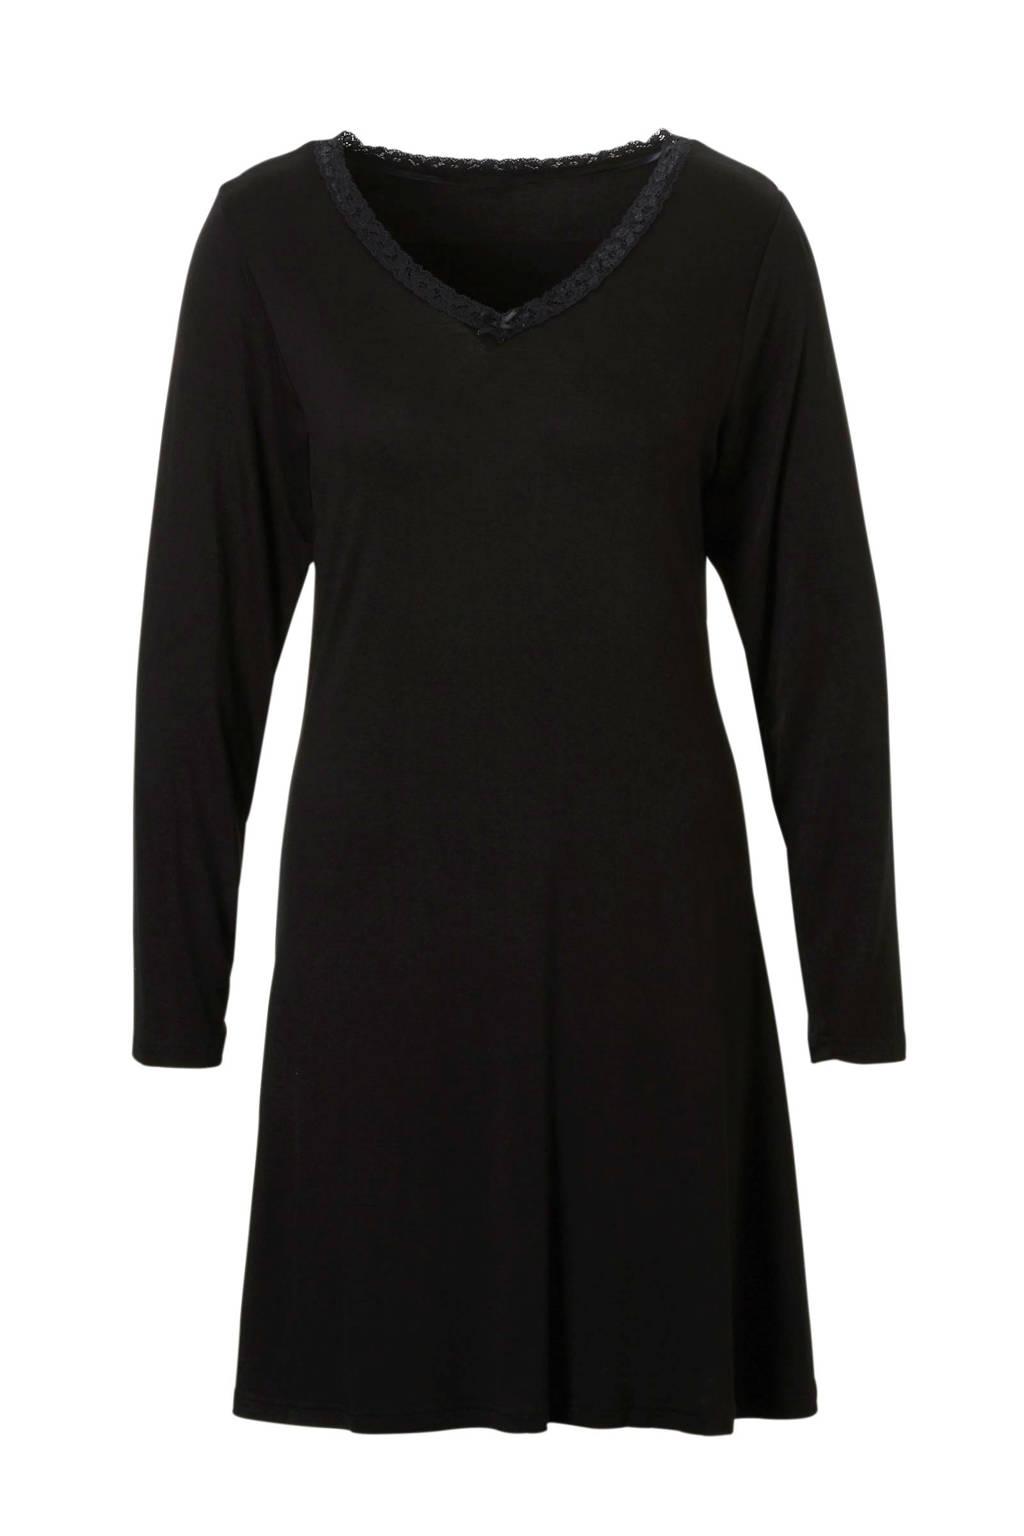 Sassa Mode nachthemd met kant zwart, Zwart